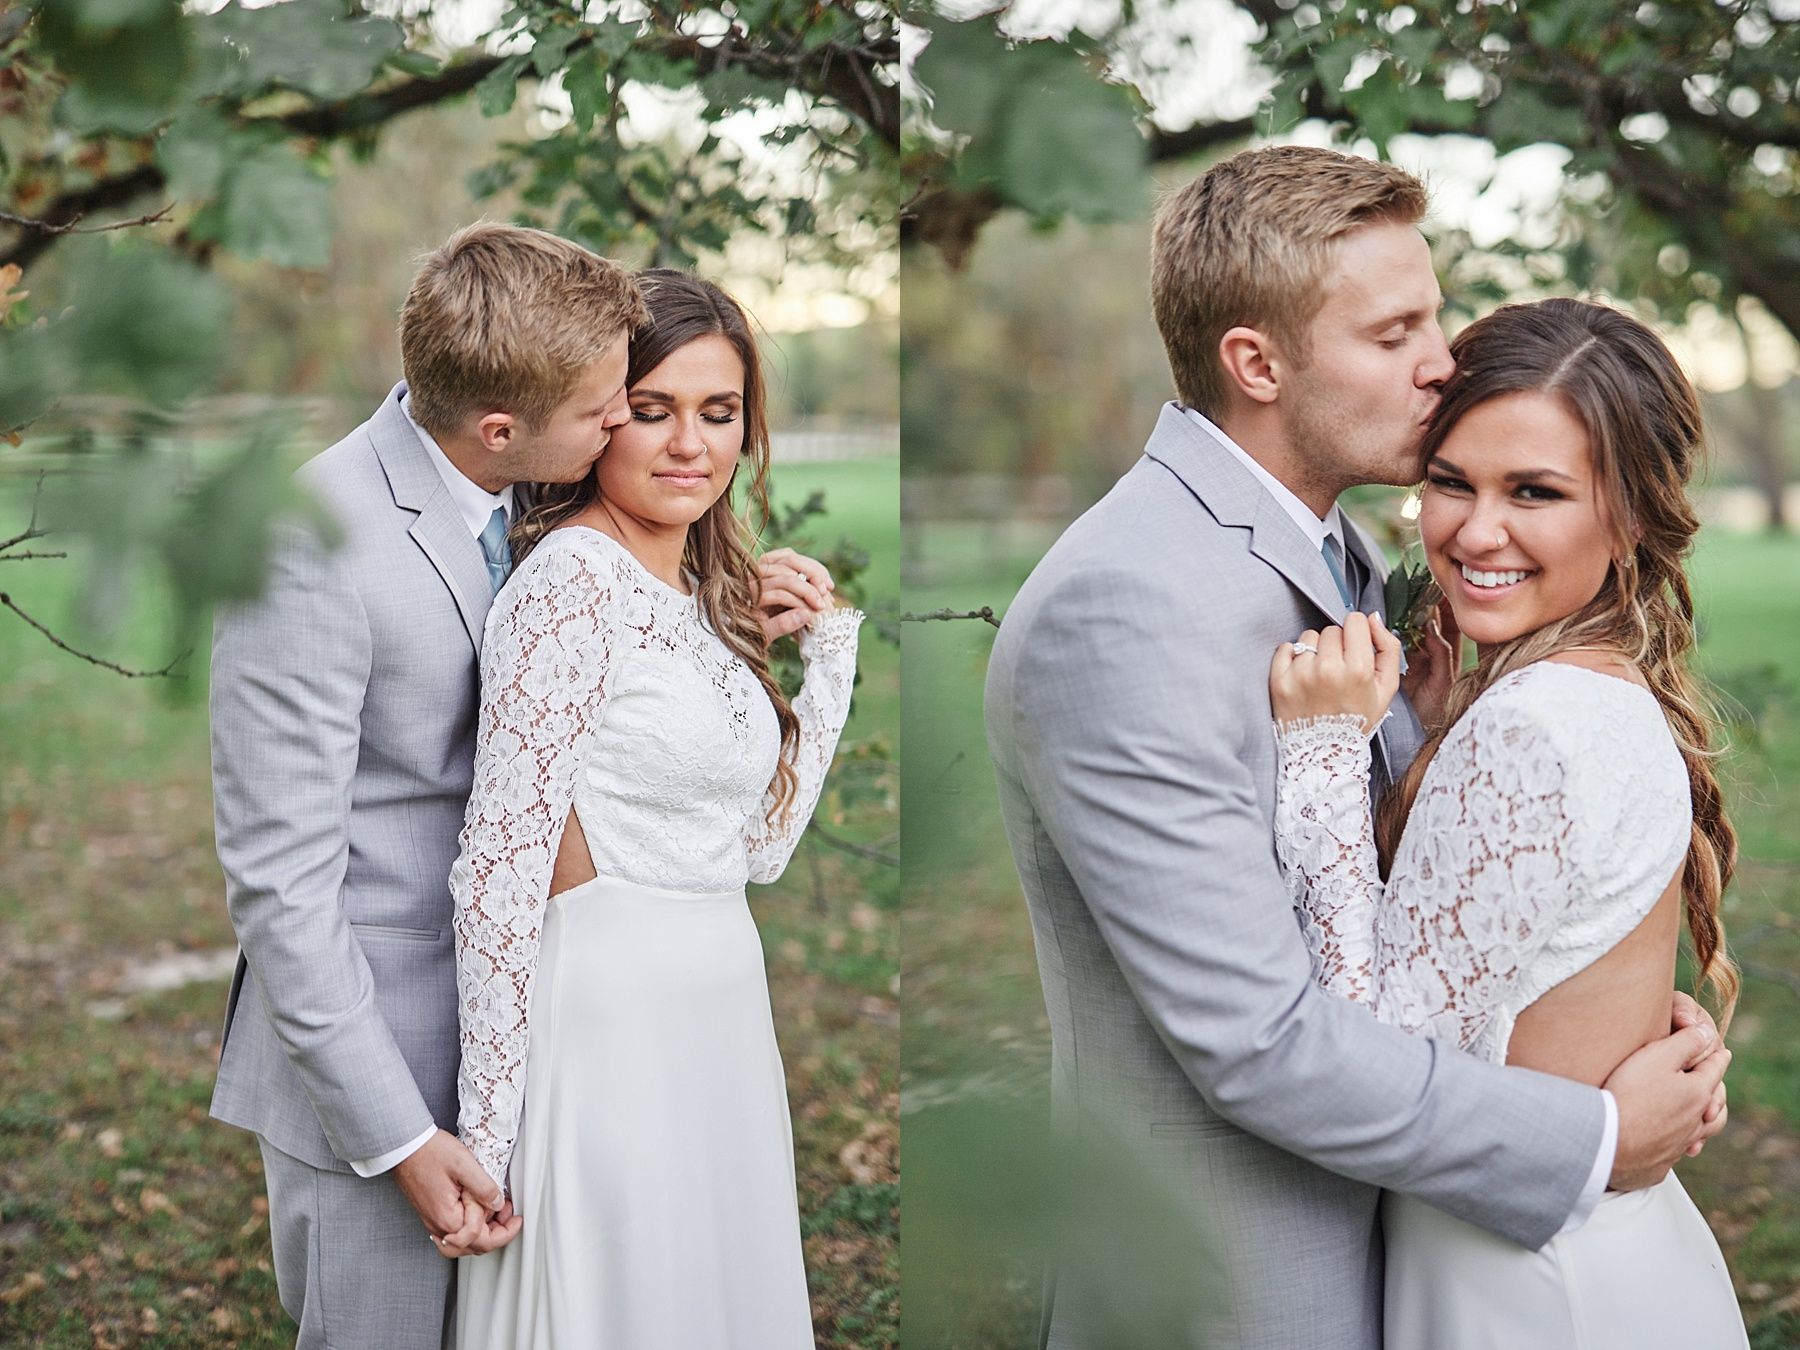 Maywood-Stone-Barn-Wedding-Rochester-Minnesota-Perry-James-Photo_0680.jpg